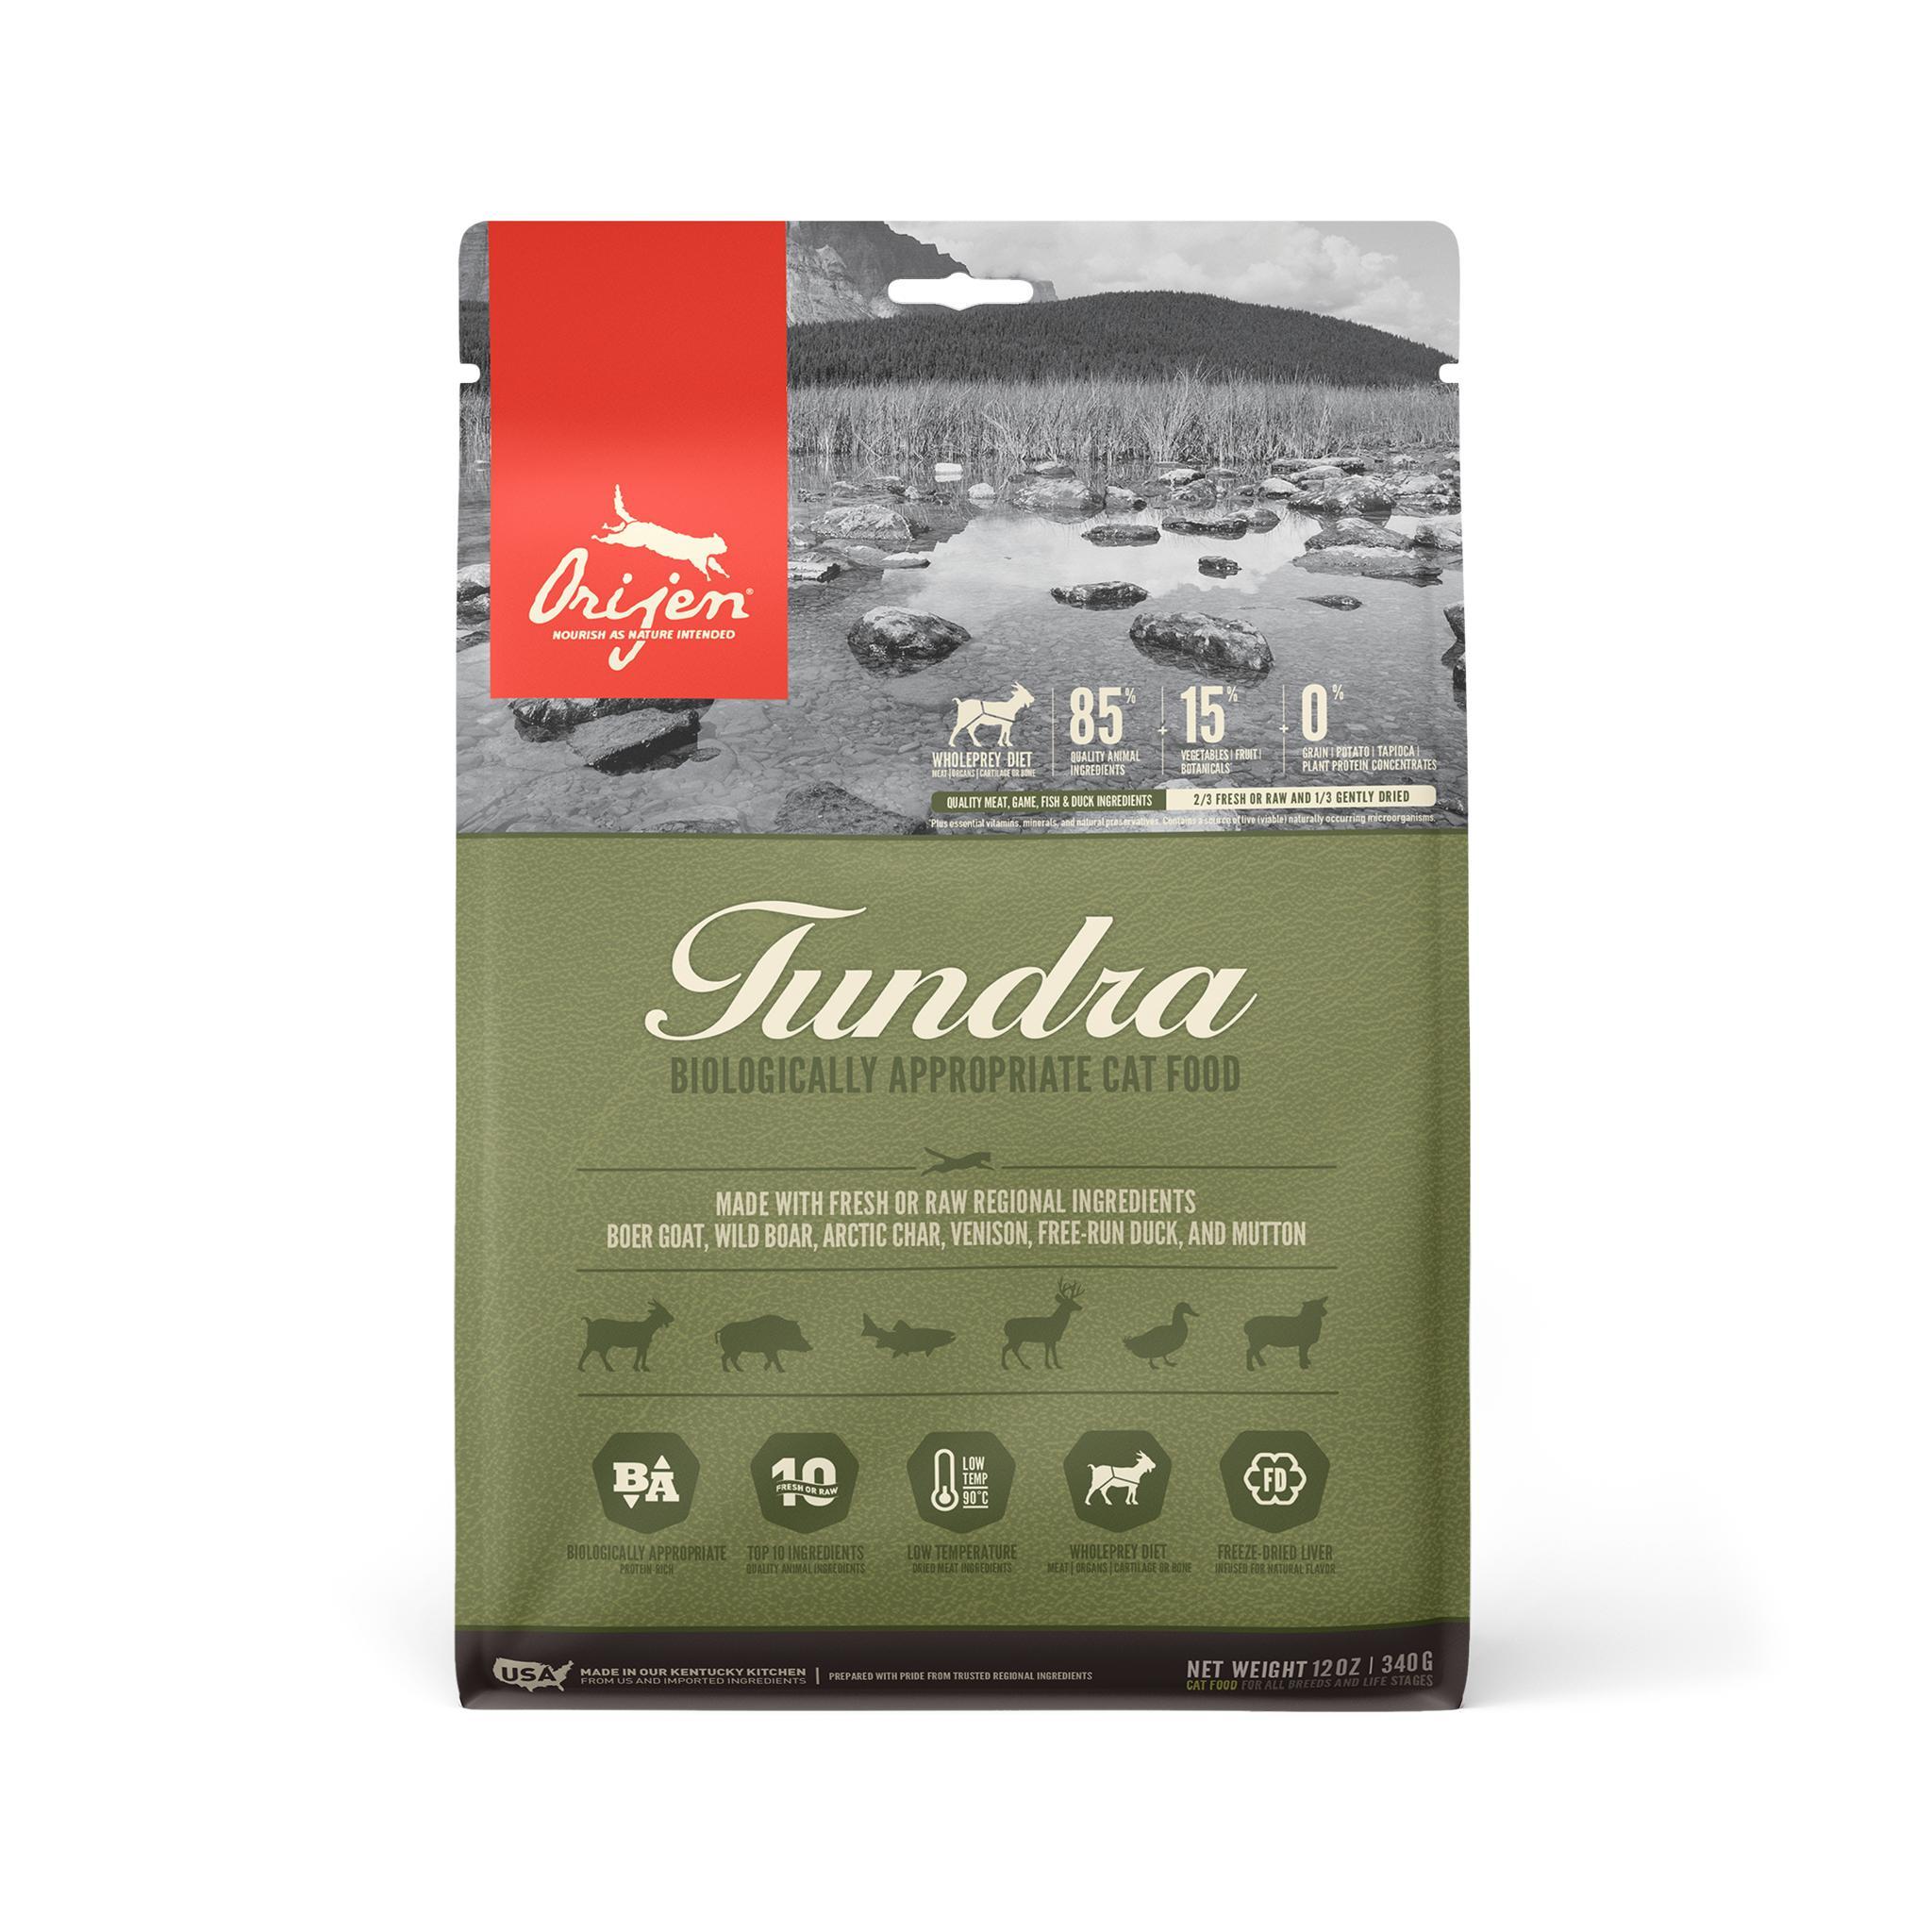 ORIJEN Tundra Grain-Free Dry Cat Food Image